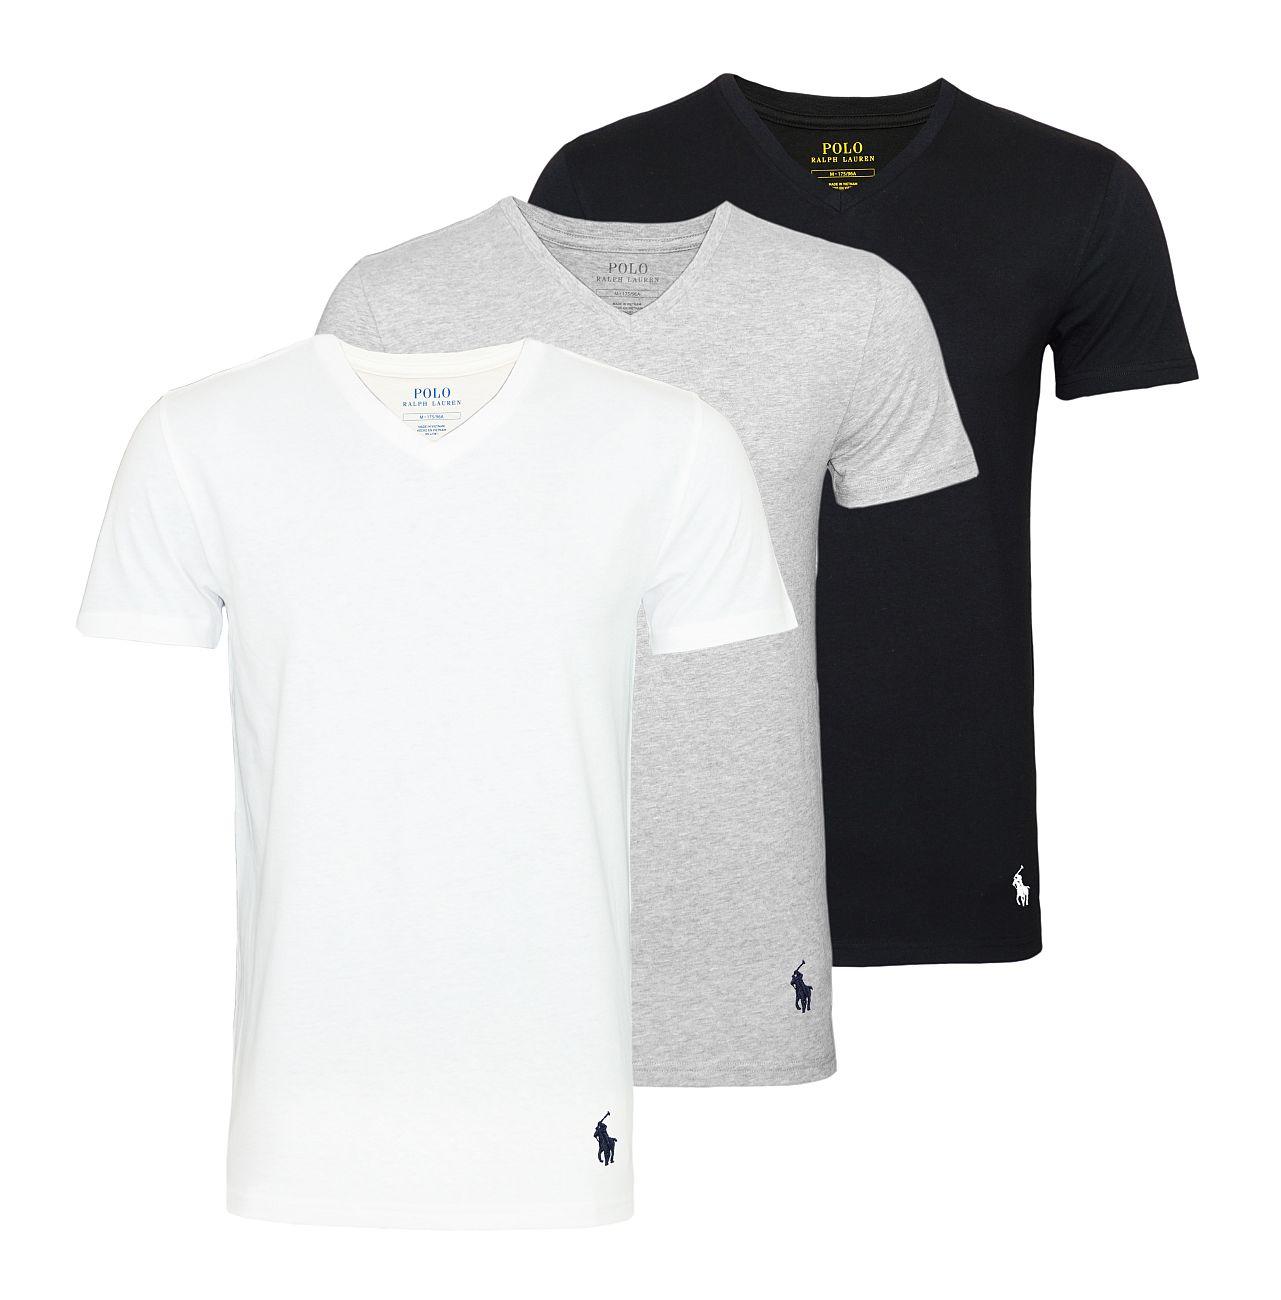 Ralph Lauren 3er Pack T-Shirts Classic V-Ausschnitt multi color 714709276003 S18-RLTS1